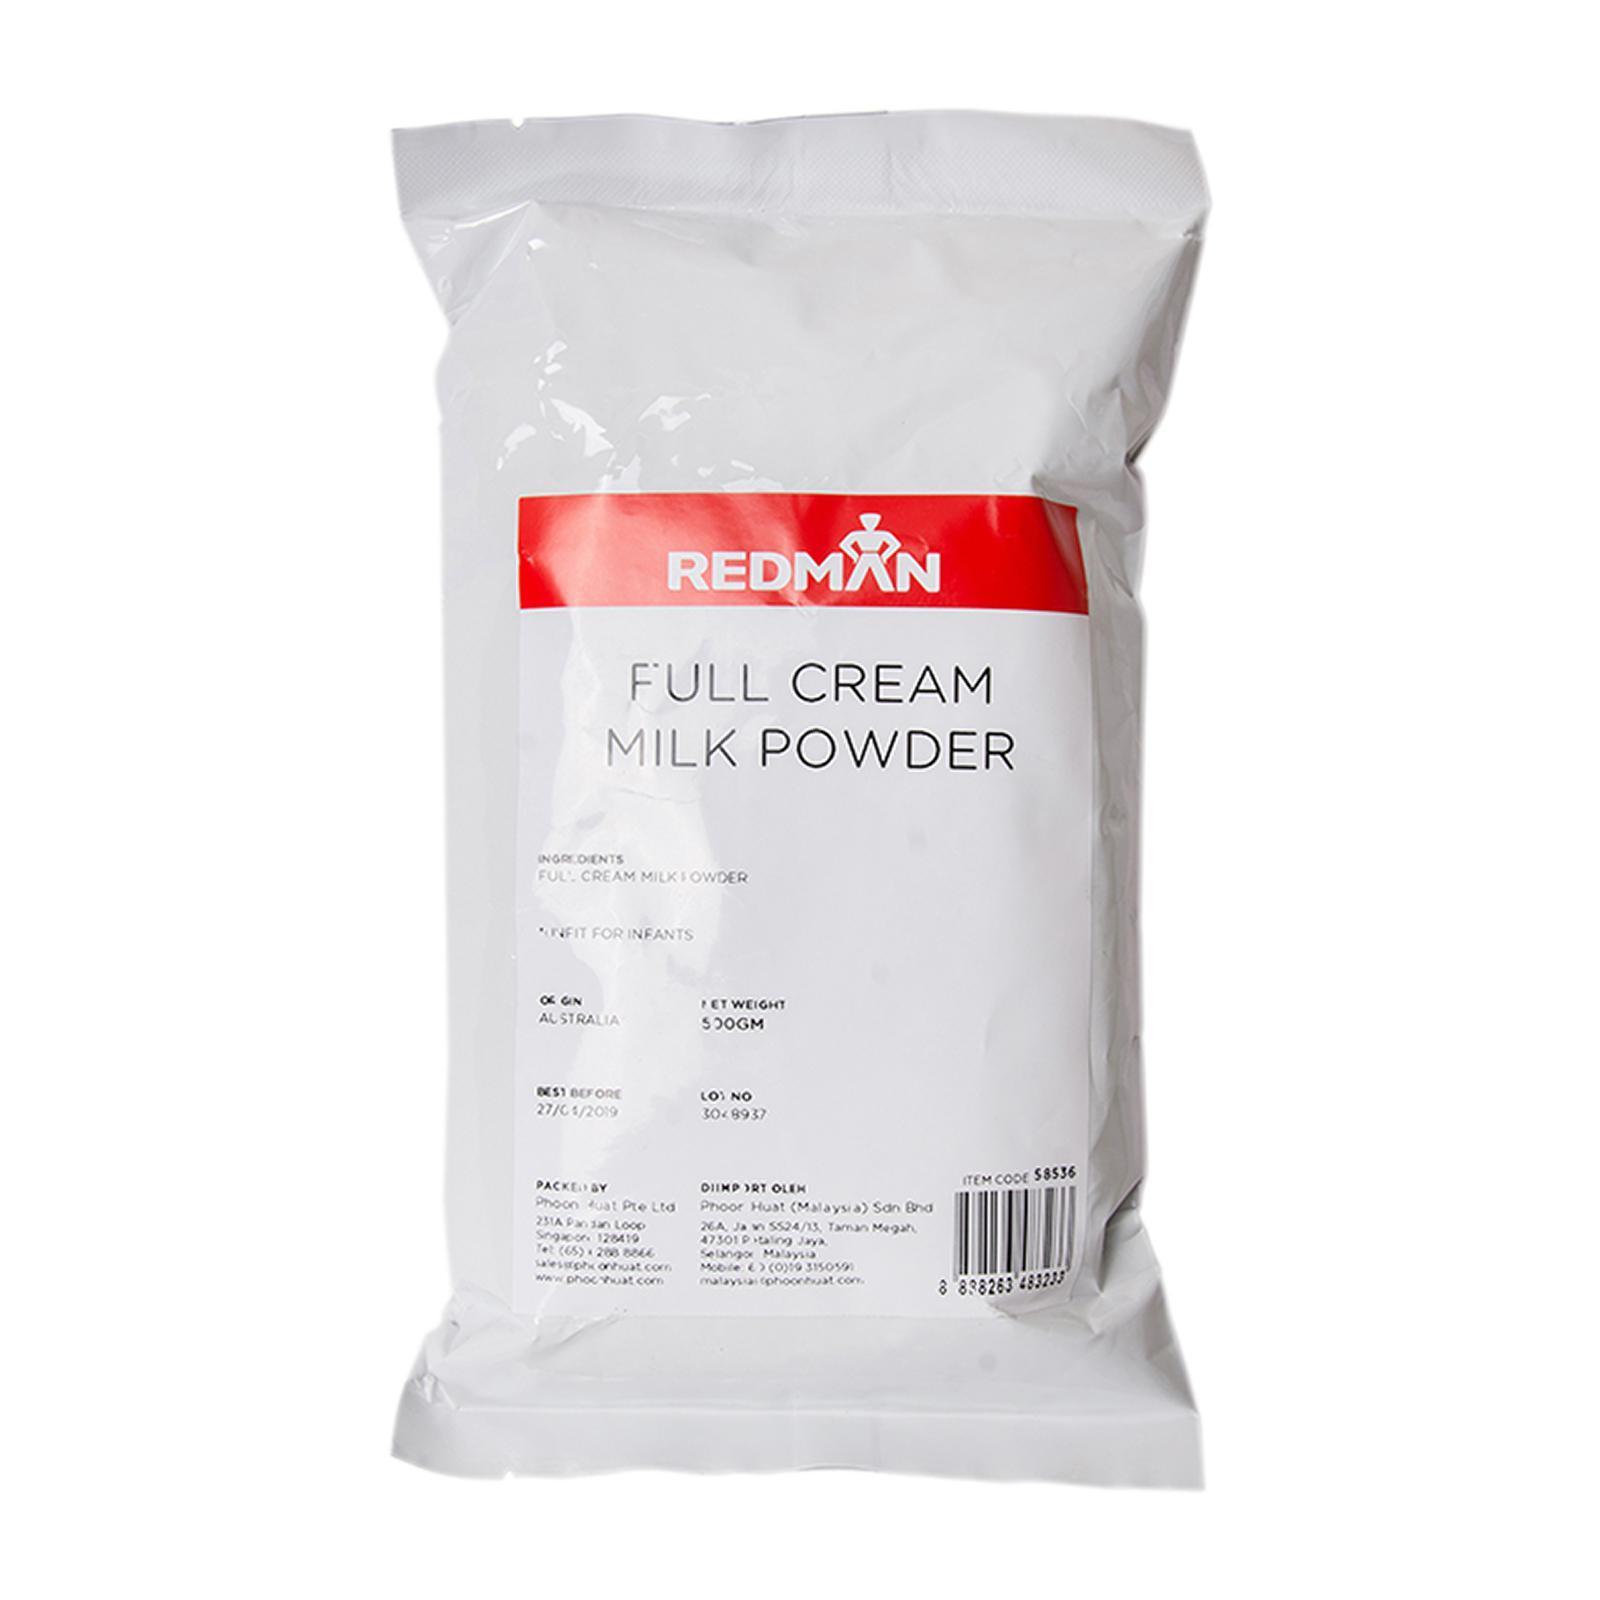 RedMan Milk Powder Full Cream